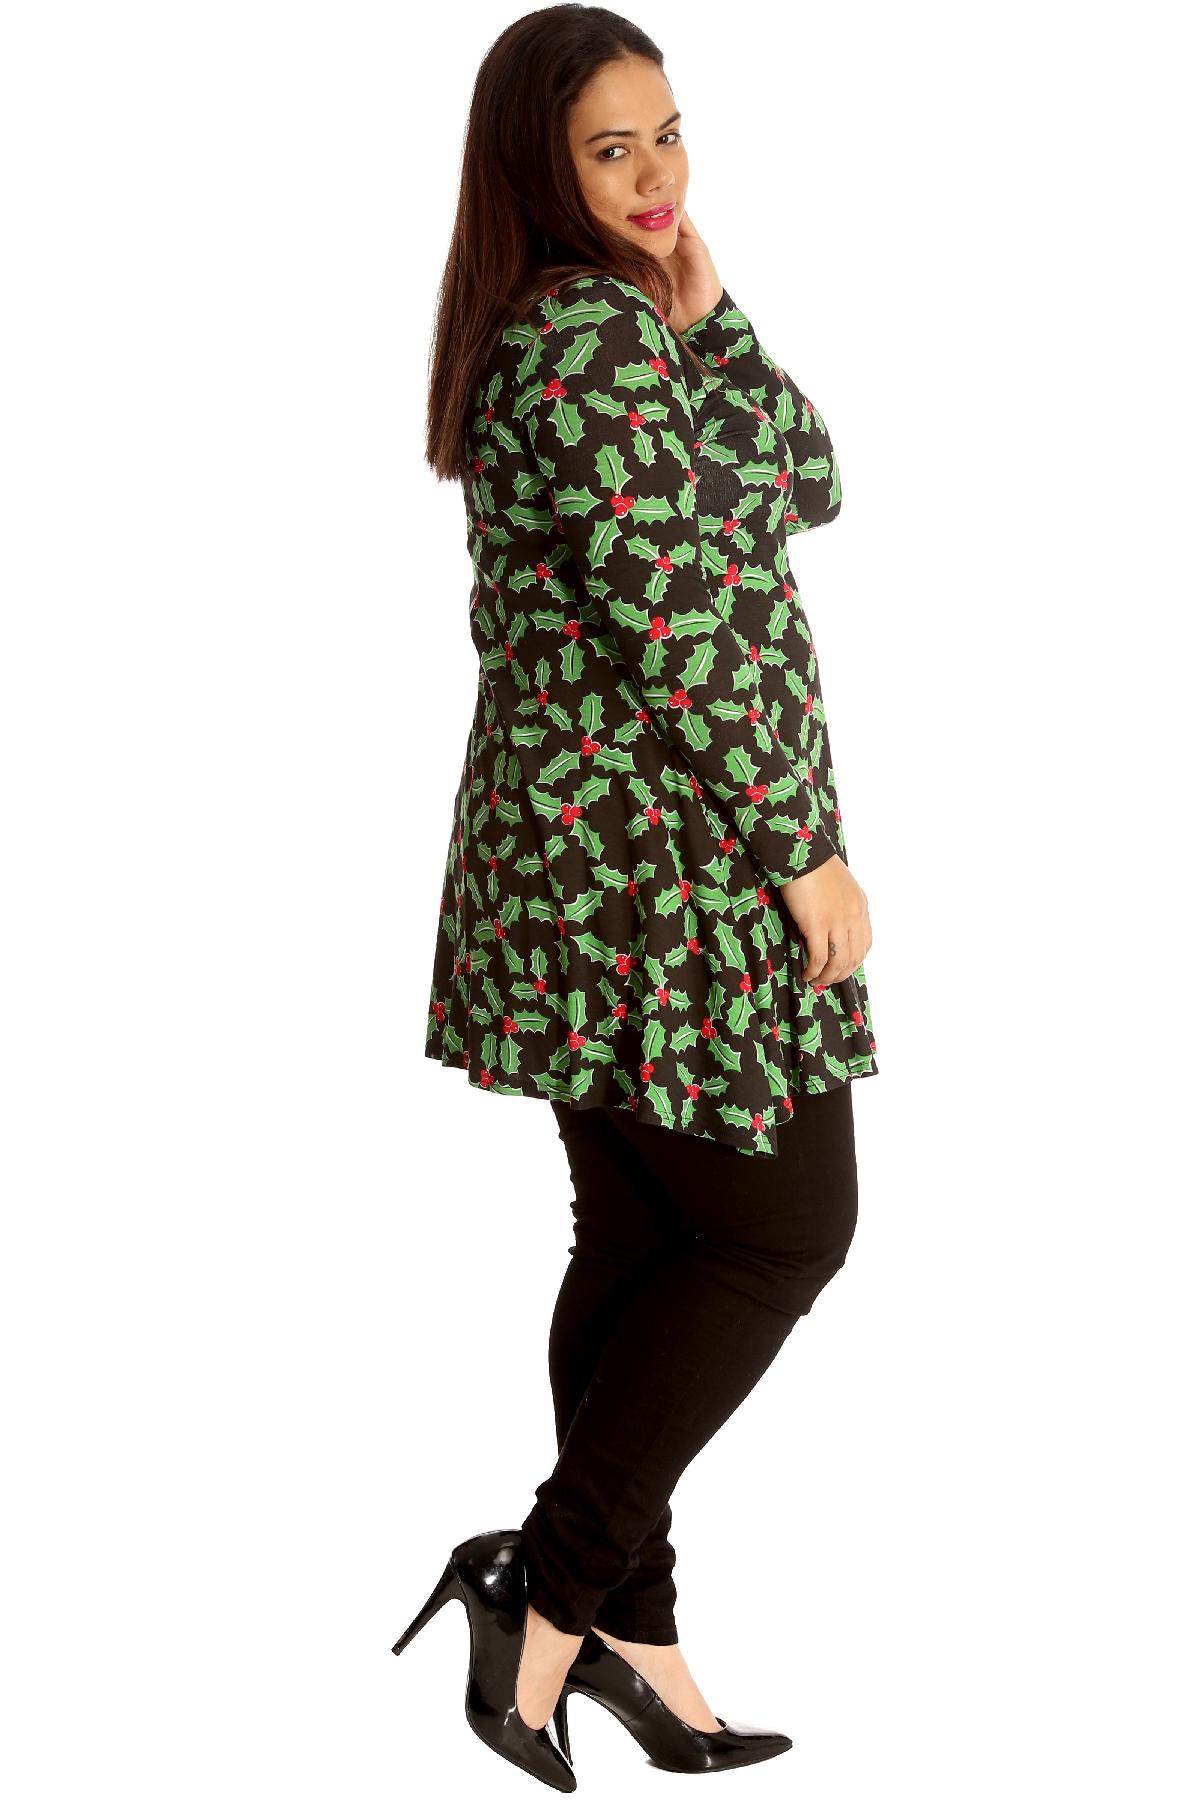 838d5d7da05 New Ladies Plus Size Top Womens Mistletoe Swing Dress Christmas ...